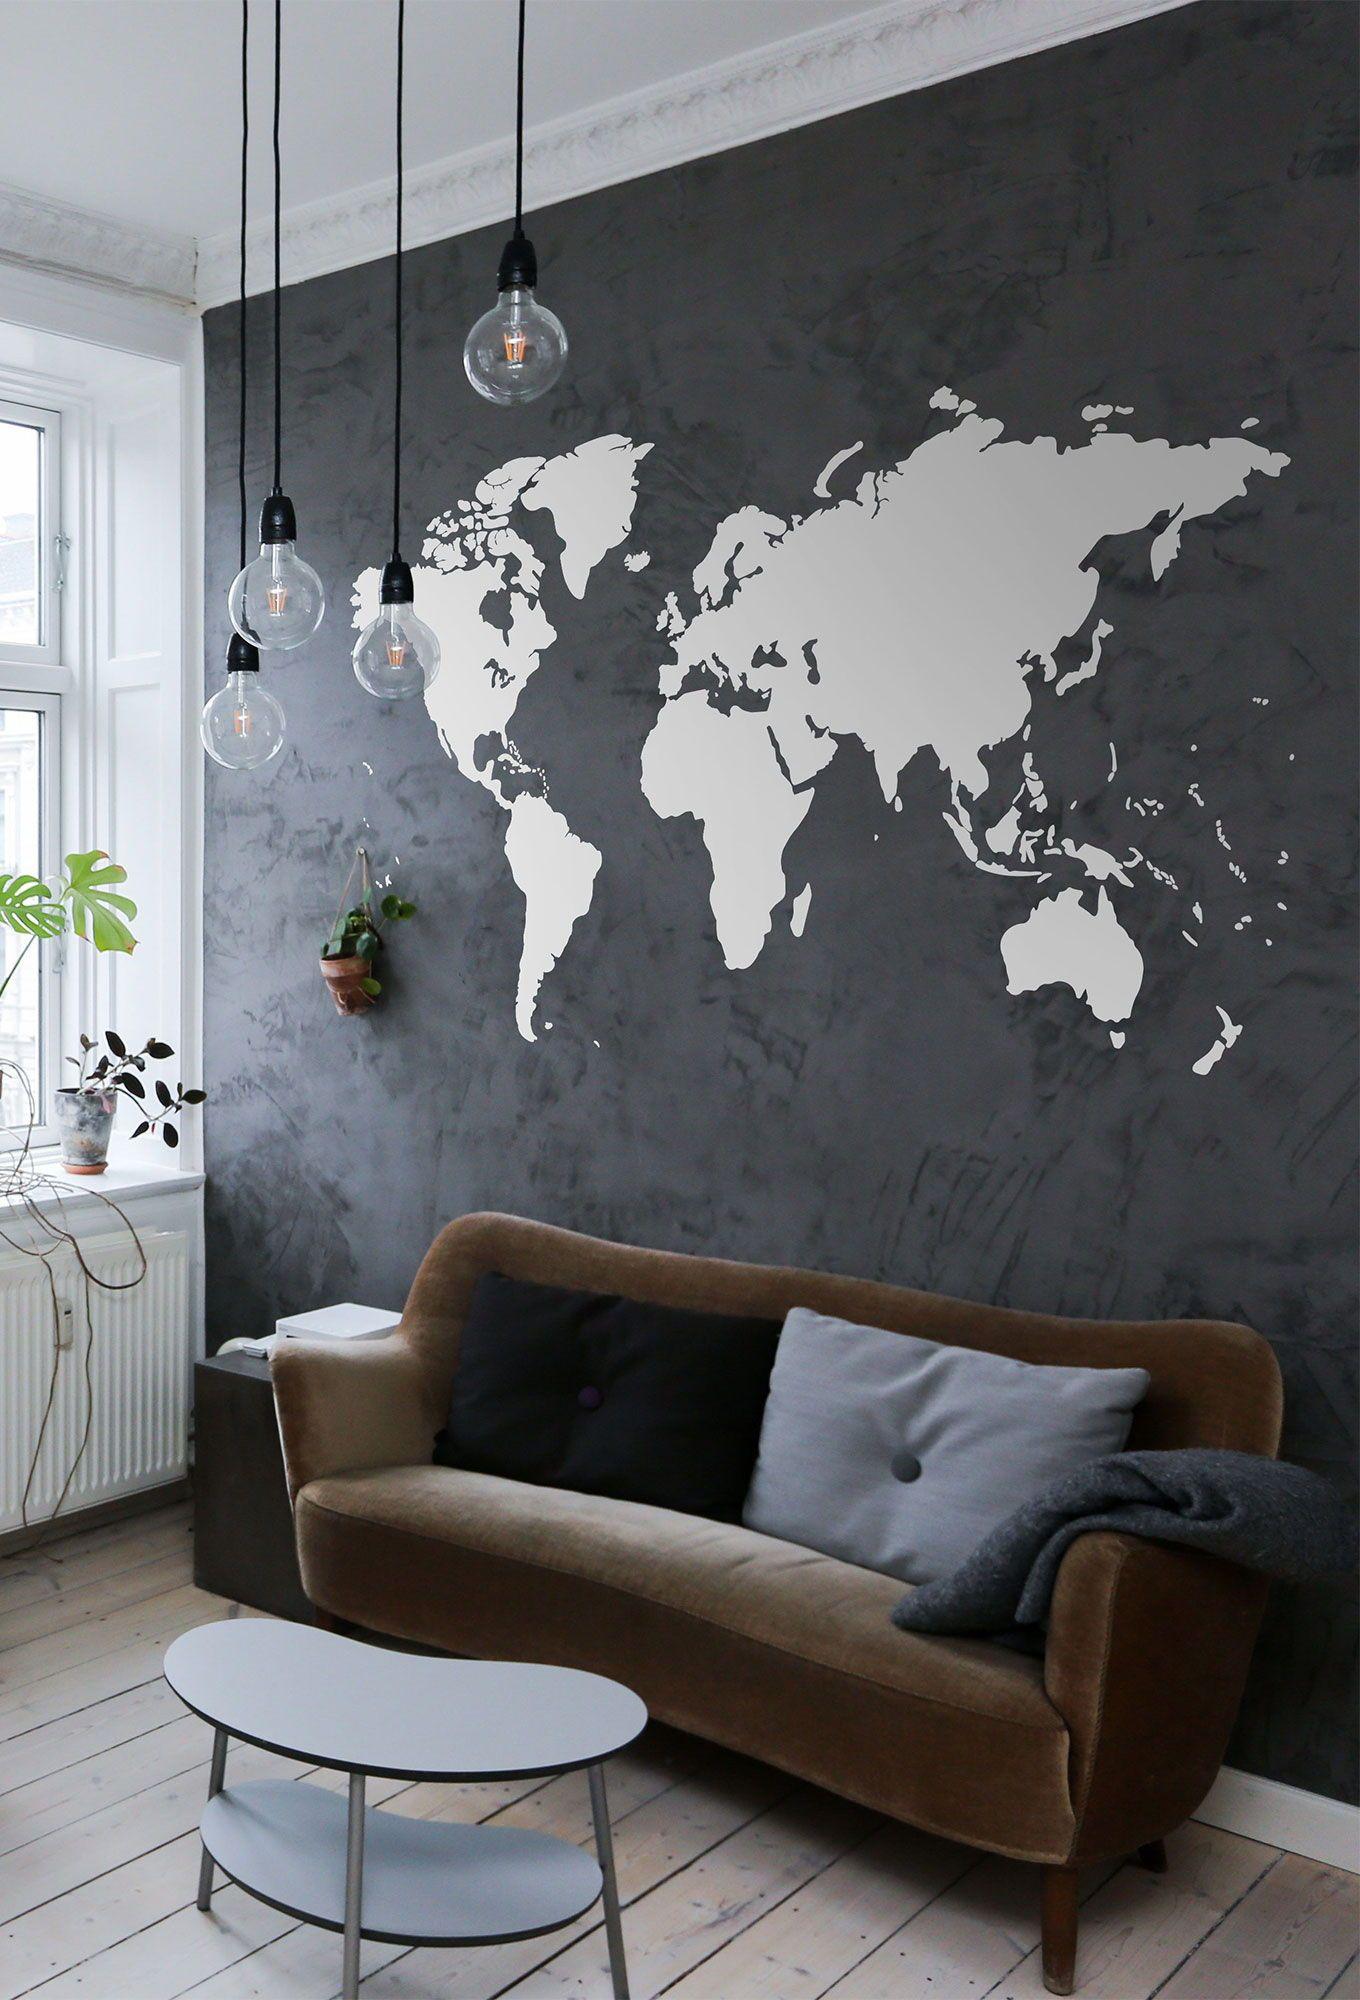 World Map Silhouette Vinyl Wall Decal Sticker Conquestmaps Map Wallart Decal Walldecals Decorideas Wall Vinyl Decor World Map Decor World Map Wall Decal